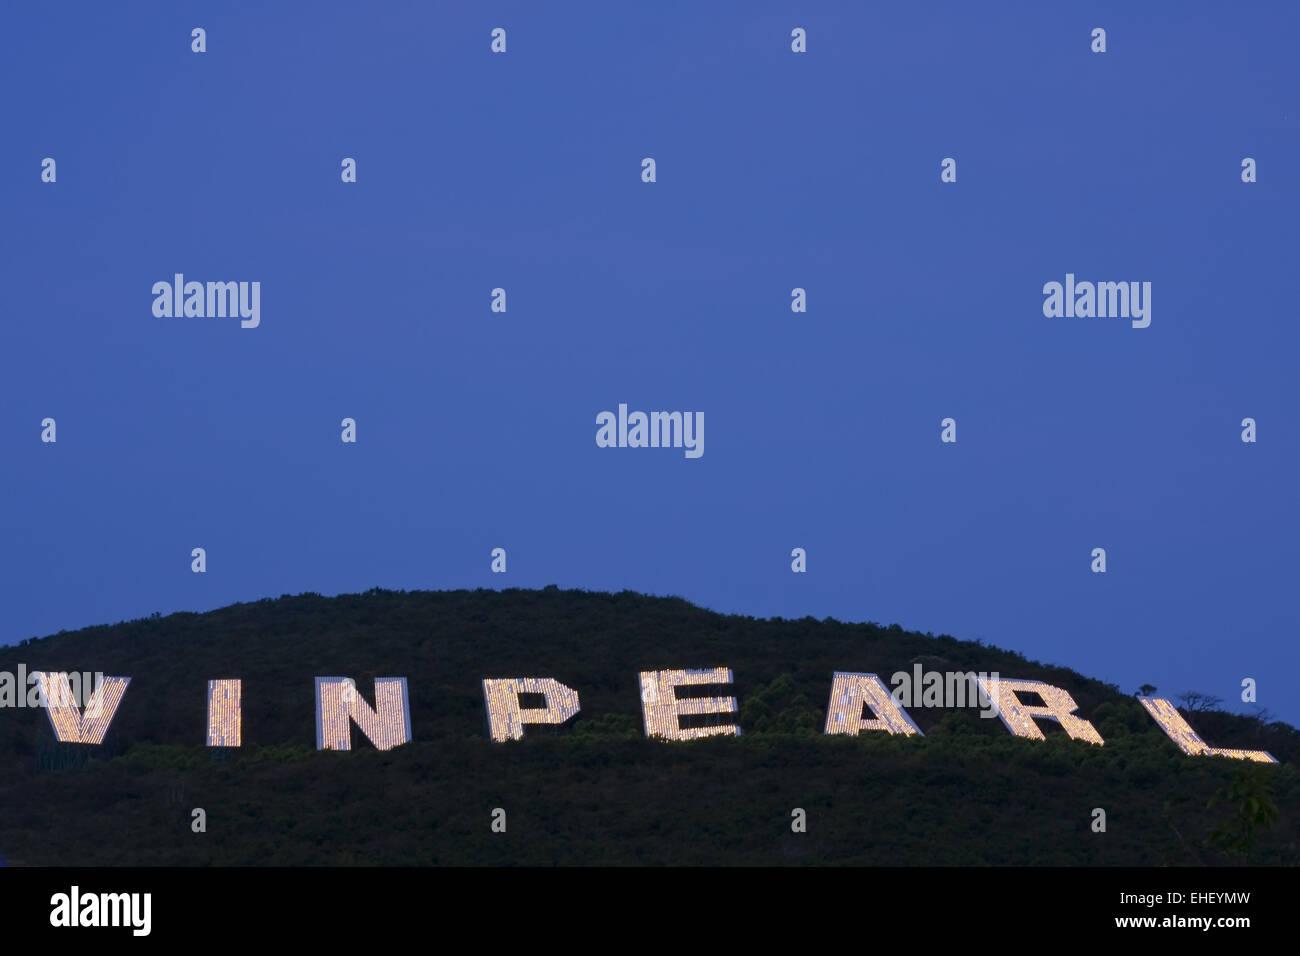 vinpearl island, nha trang, vietnam, asia - Stock Image